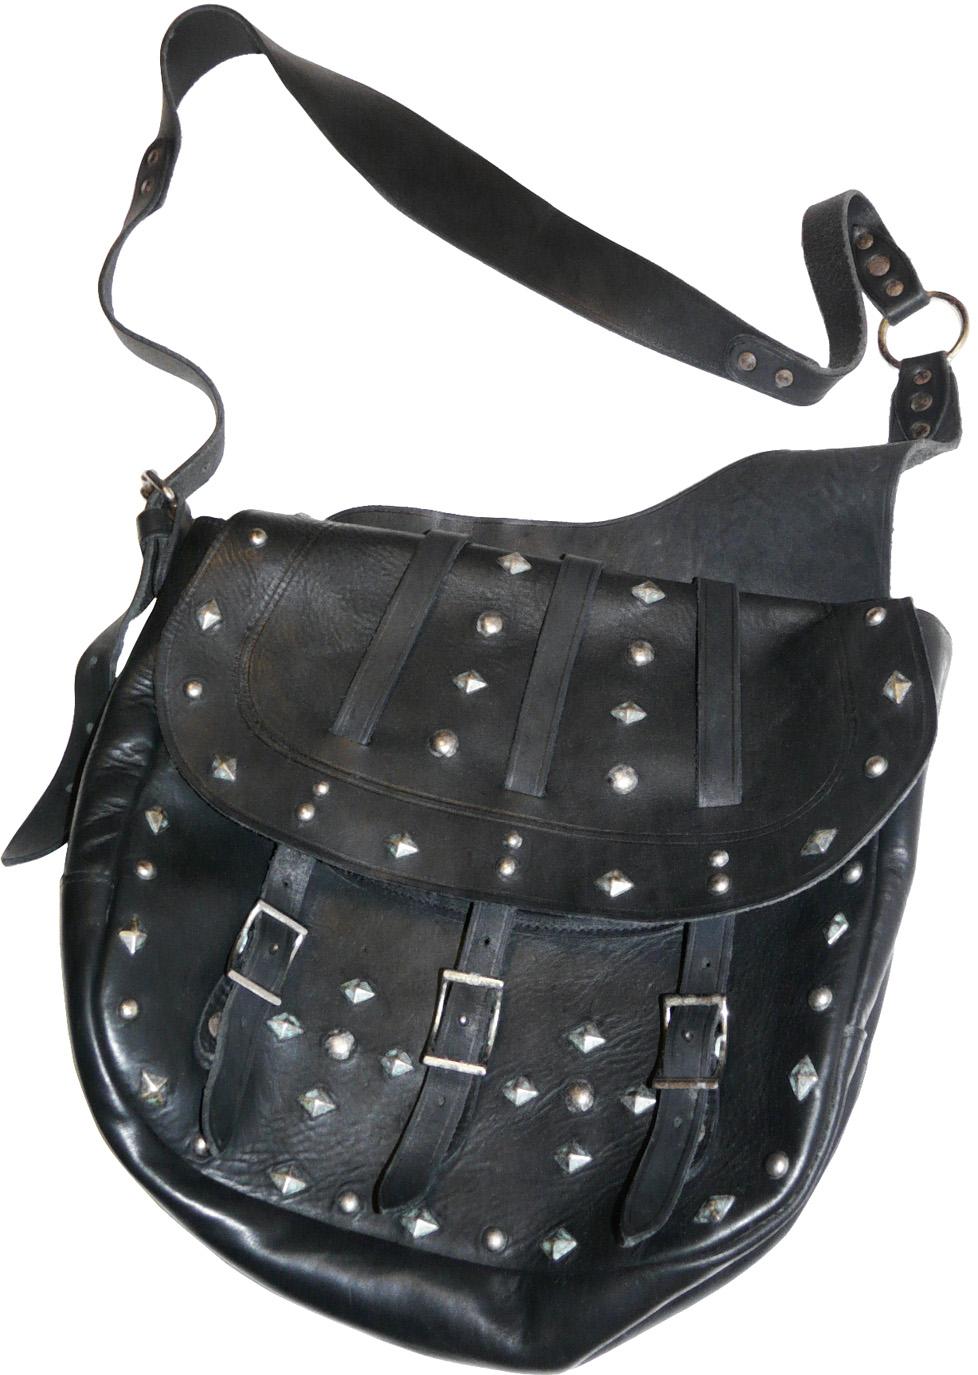 Altamont Bag 1.jpg